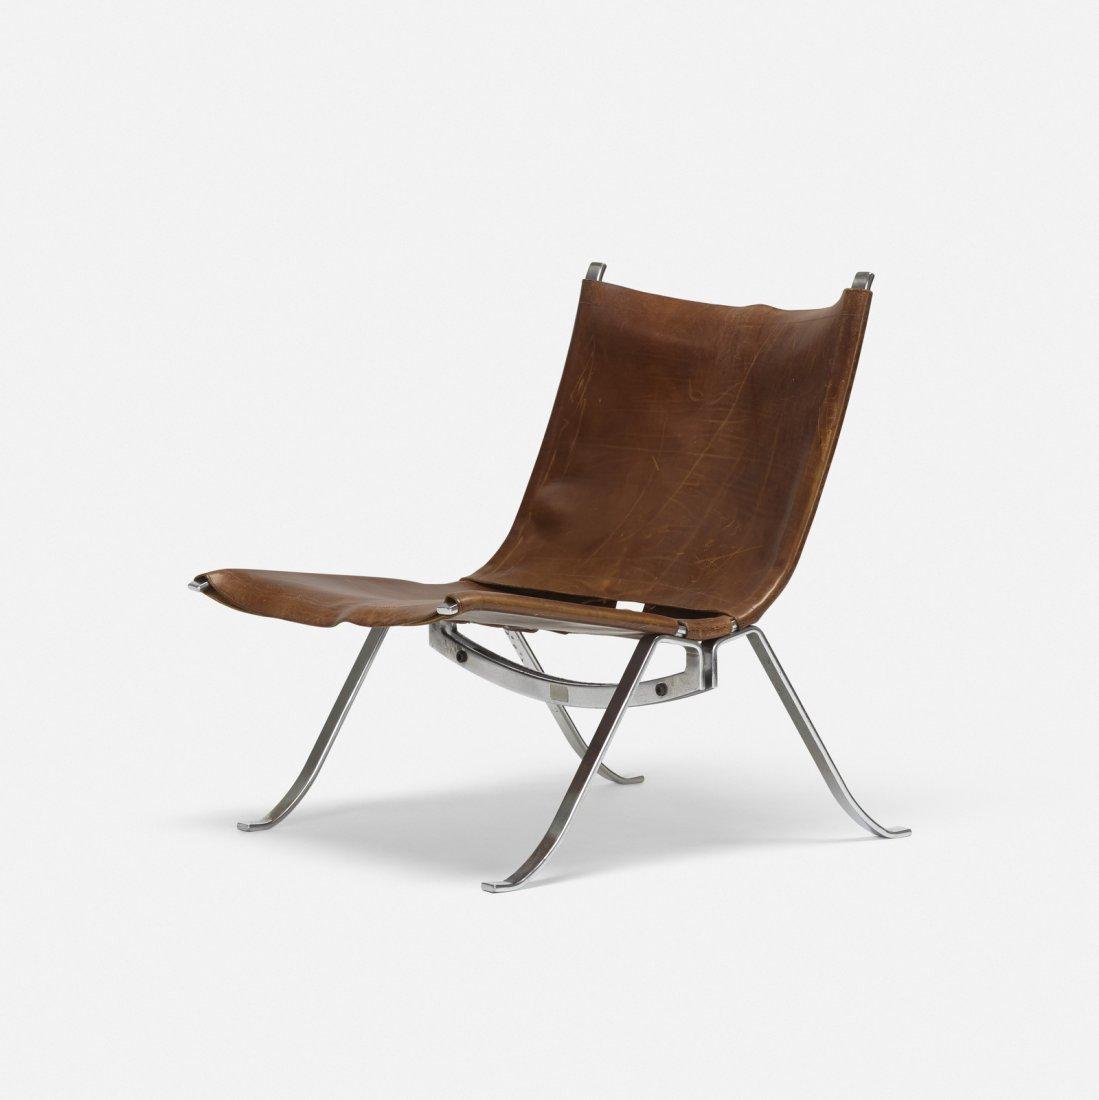 Preben Fabricius and Jorgen Kastholm, lounge chair